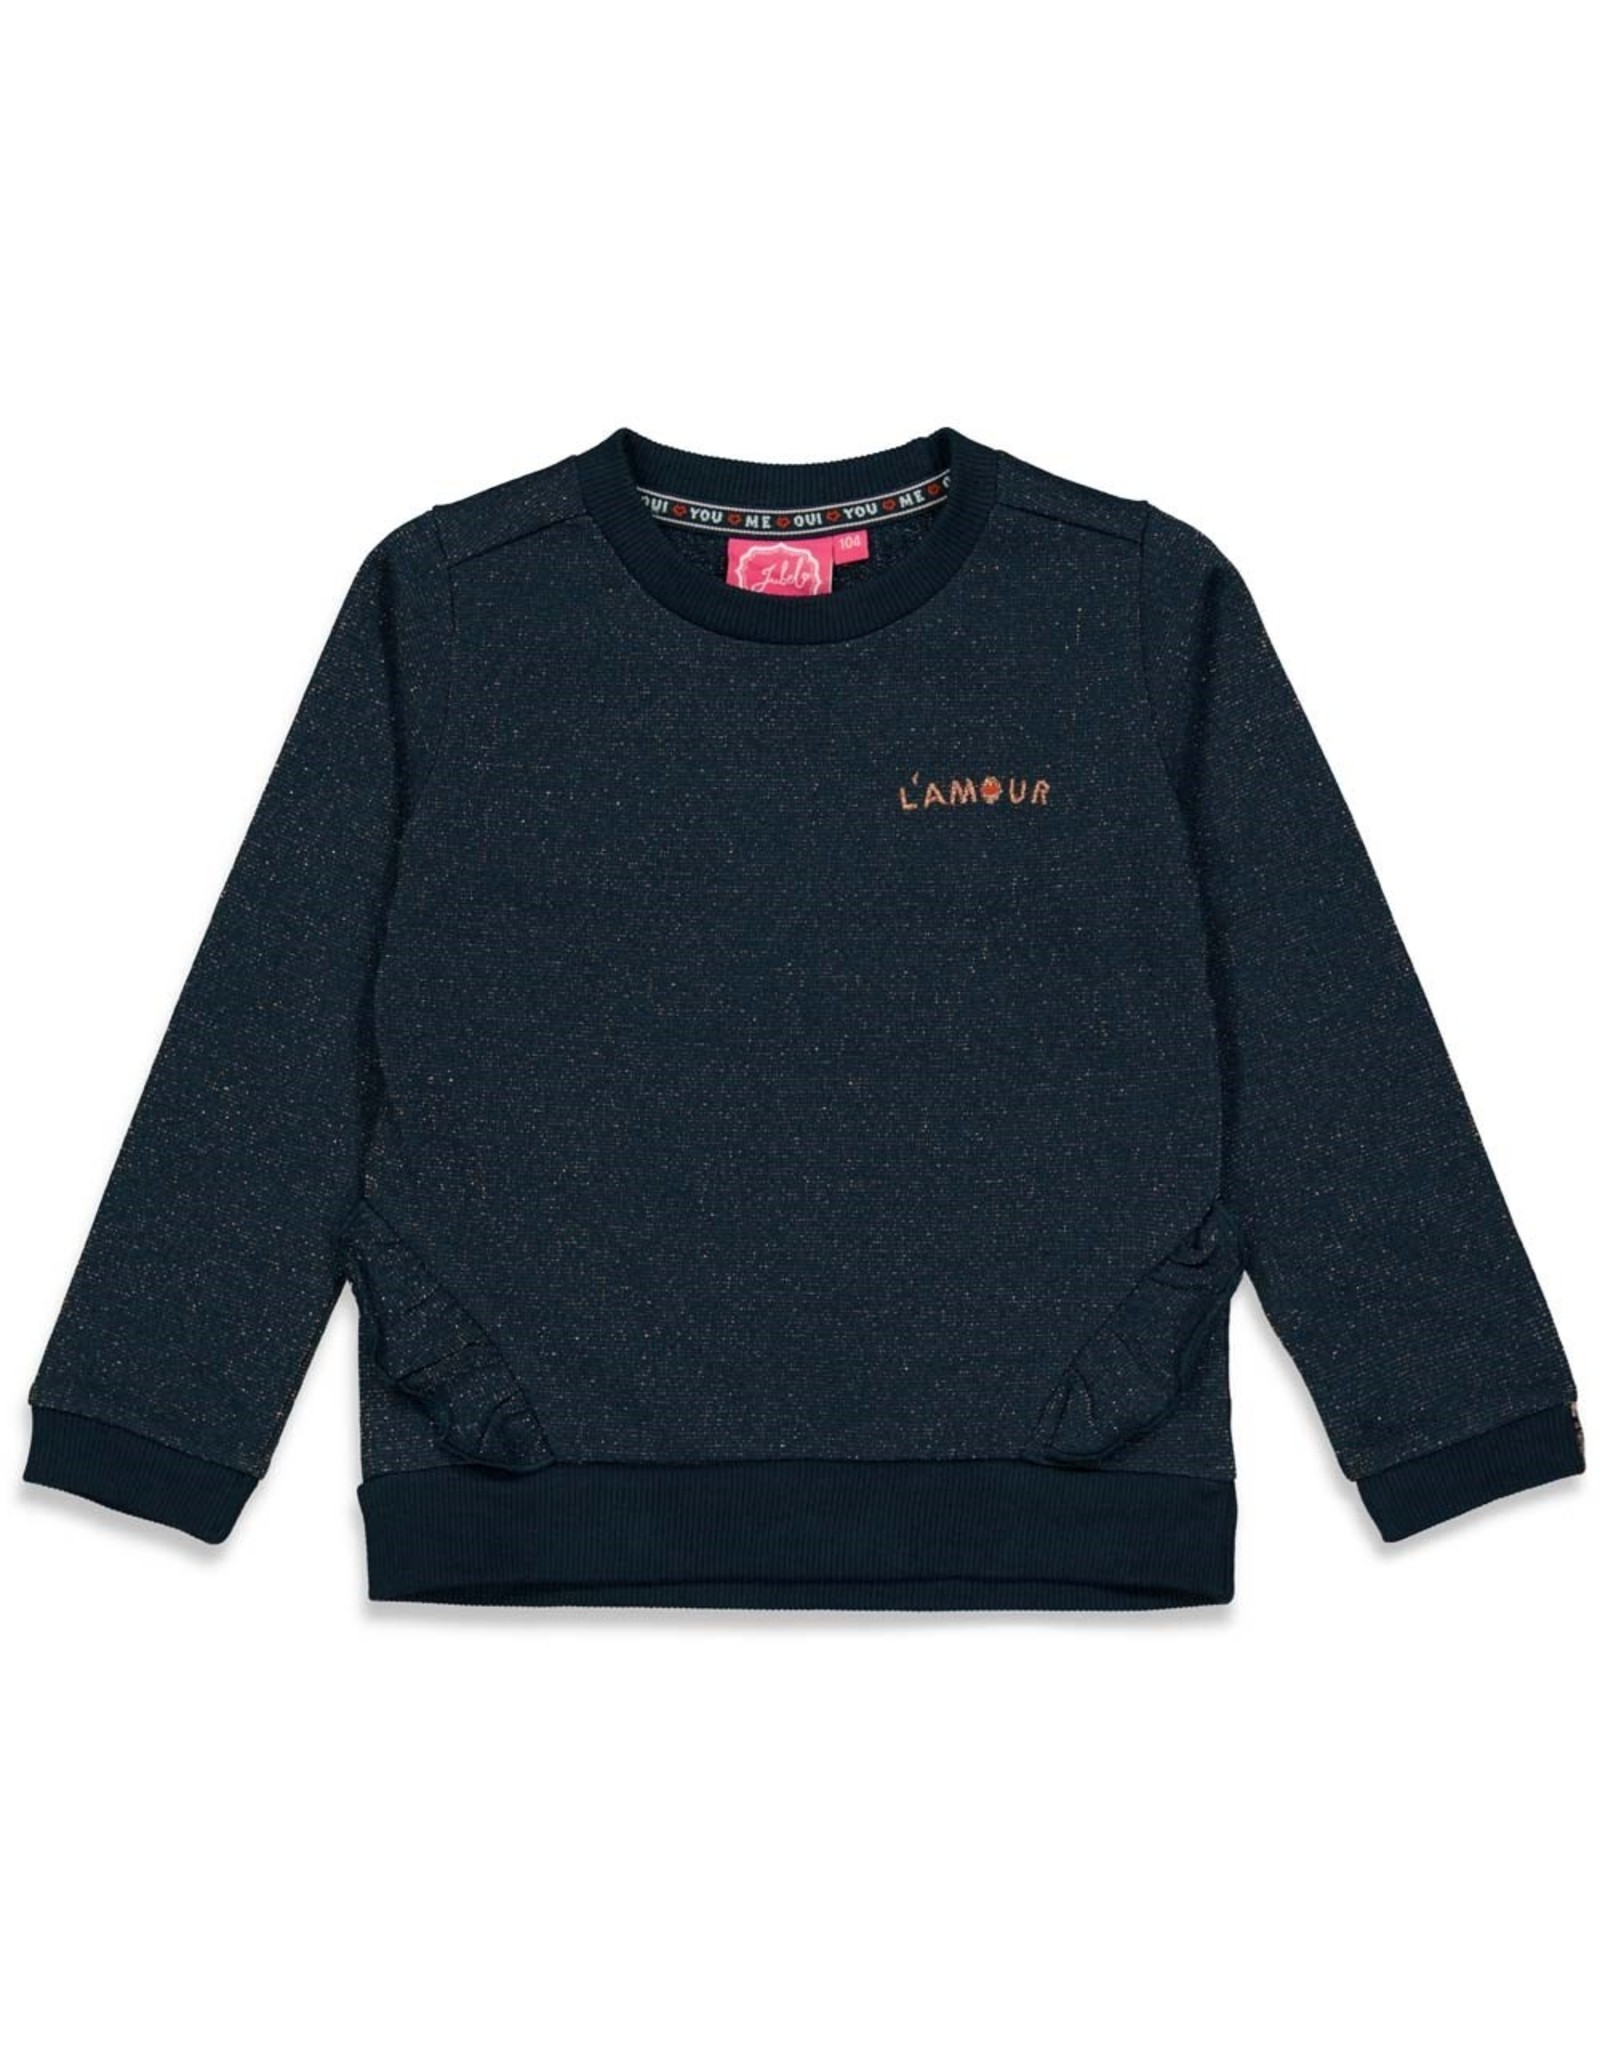 Jubel Sweater  - Club Amour Marine